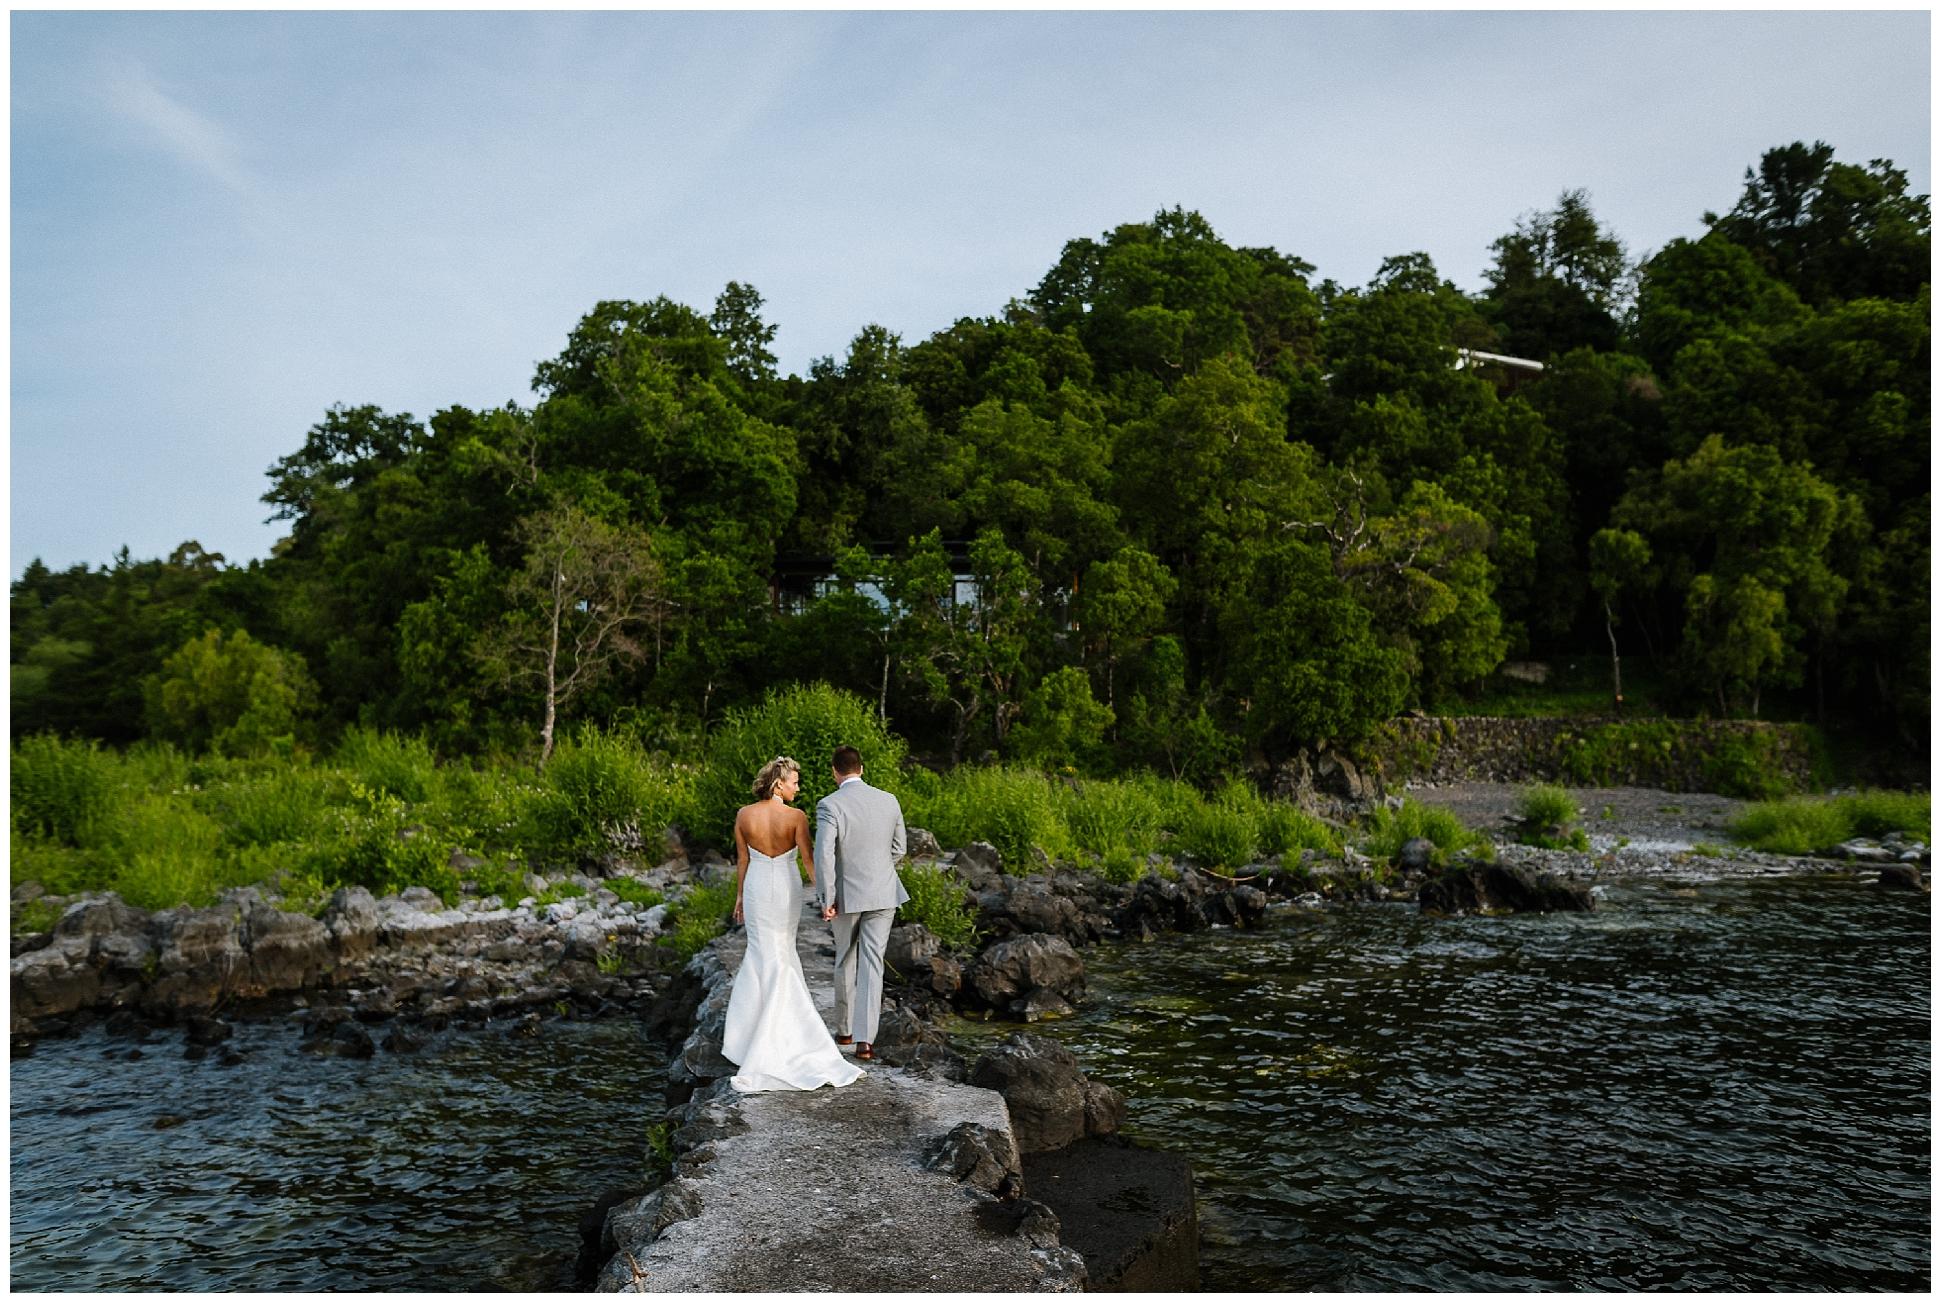 Cheilean-destination-adventure-wedding-florida-patagonia-pucon-santa-cruz-vsco_0129.jpg